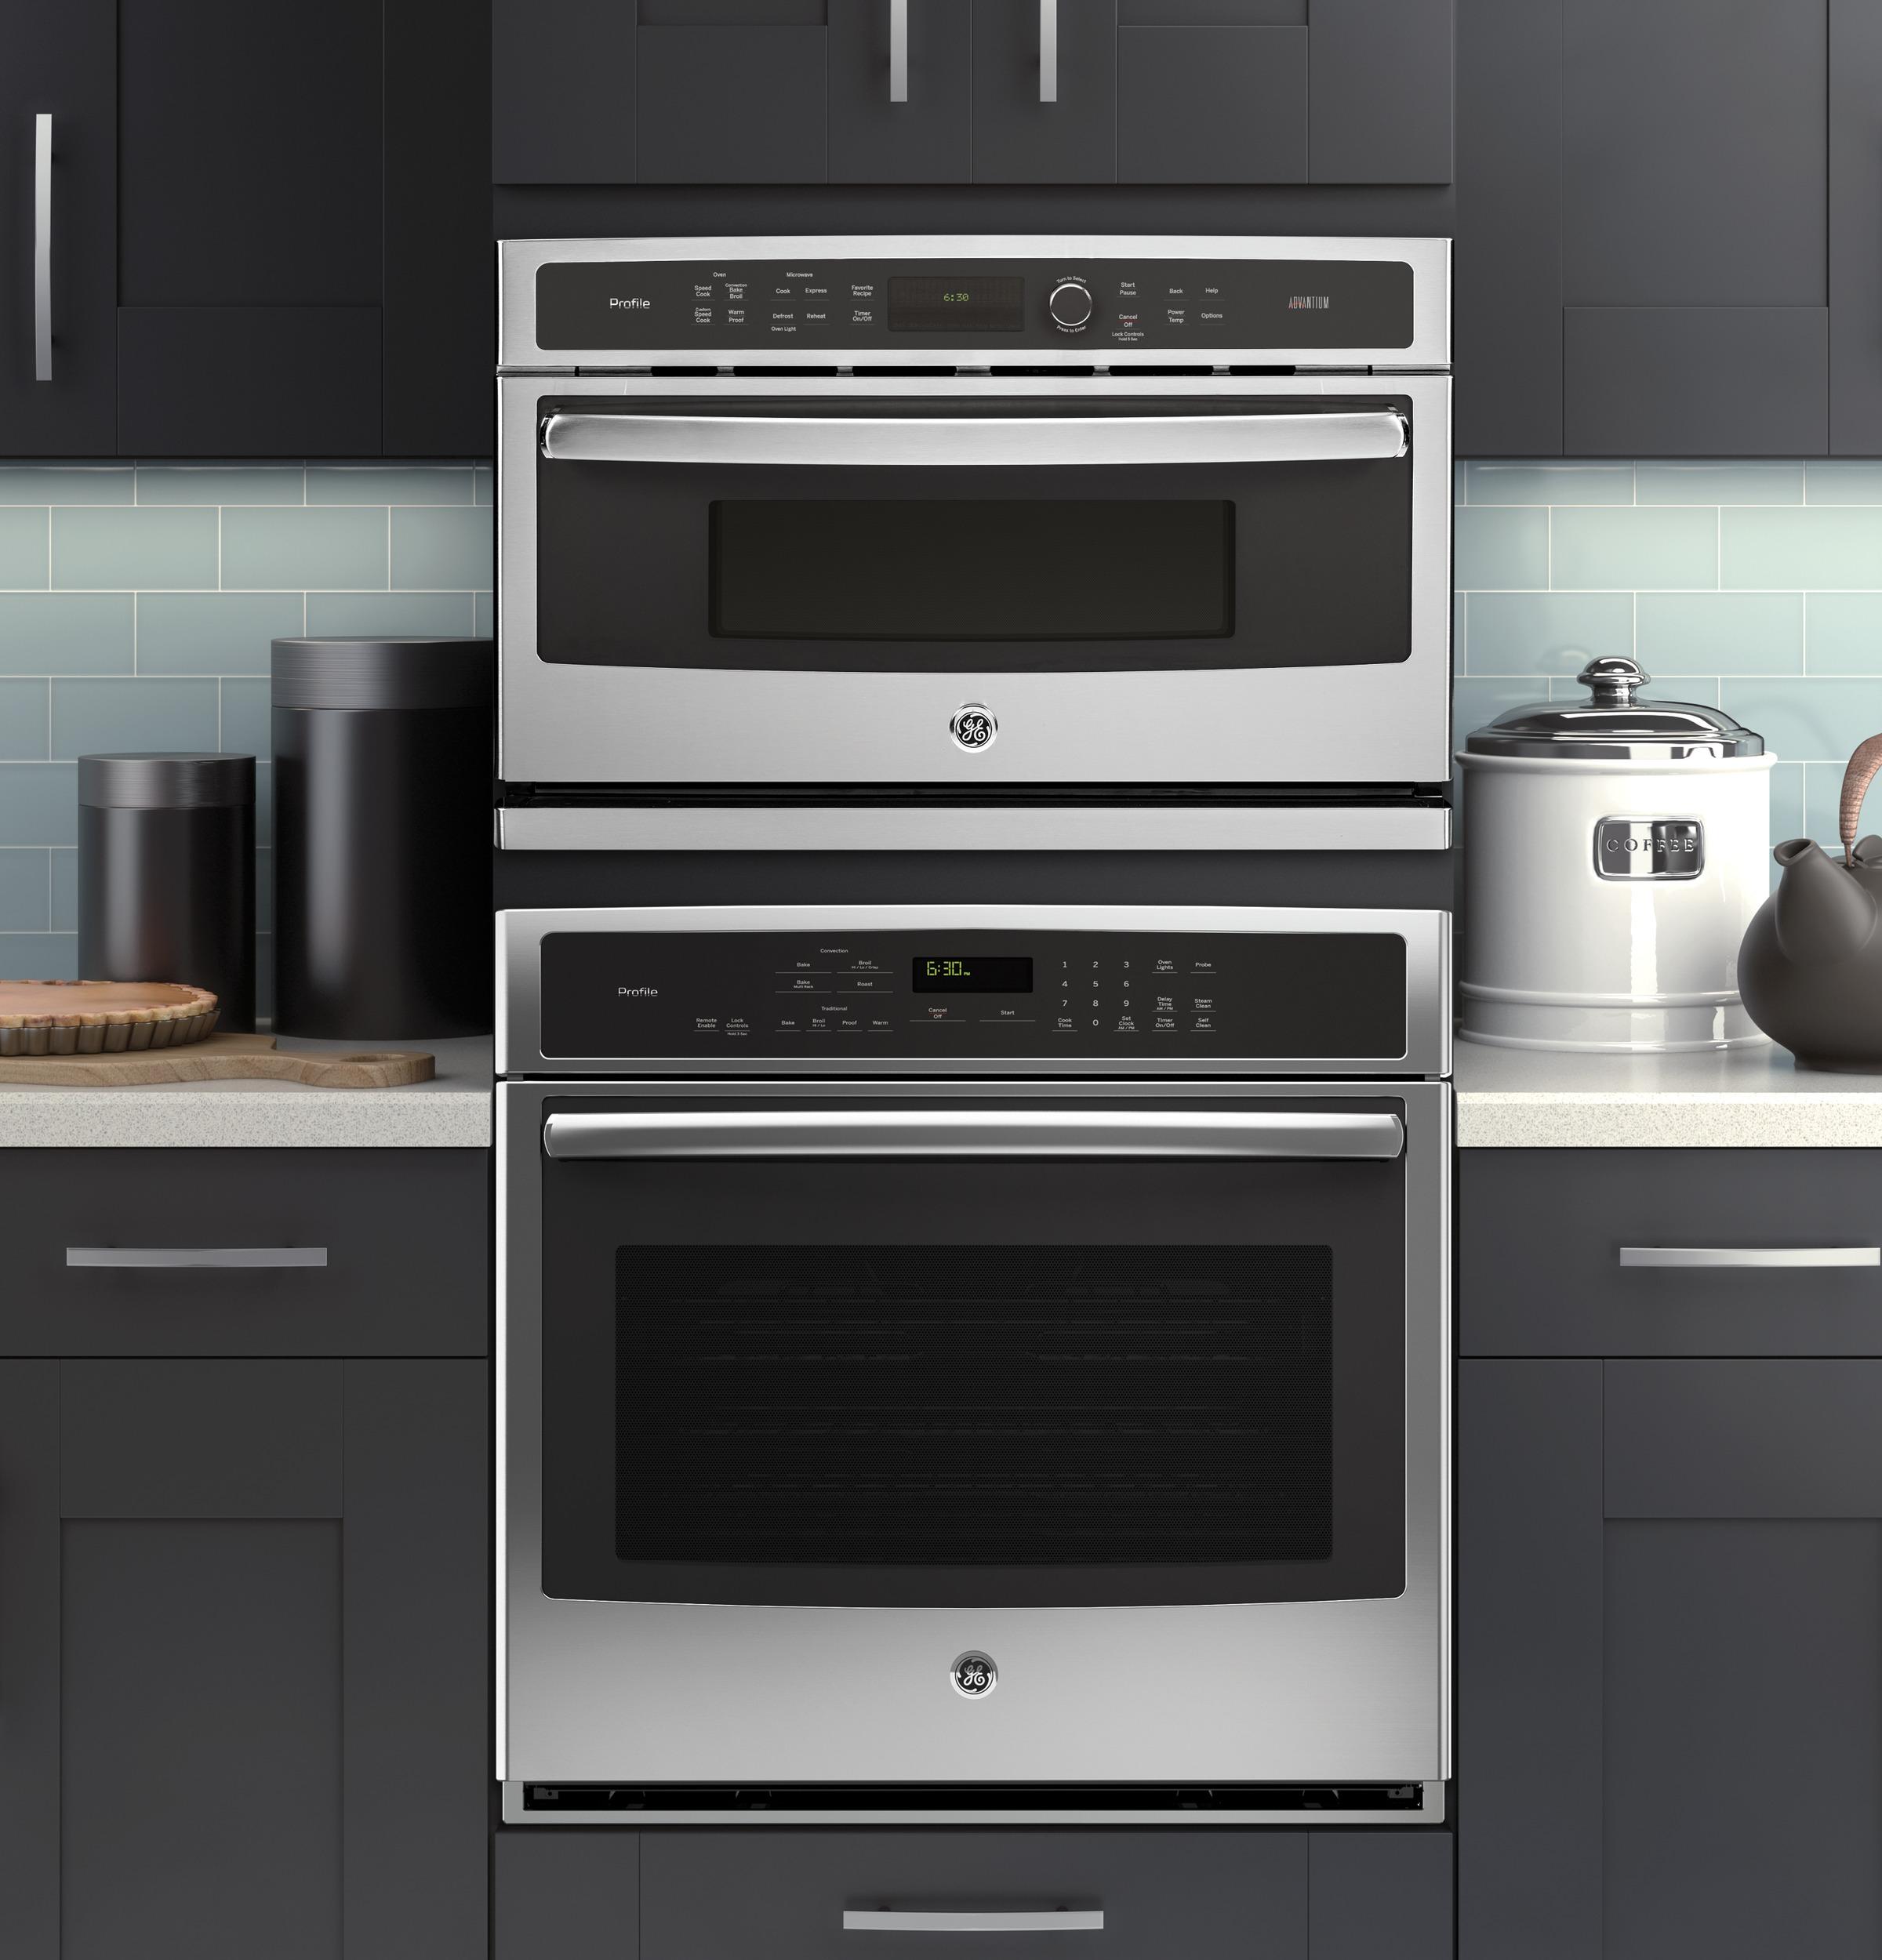 Model: PSB9240SFSS | GE Profile GE Profile™ 30 in. Single Wall Oven with Advantium® Technology